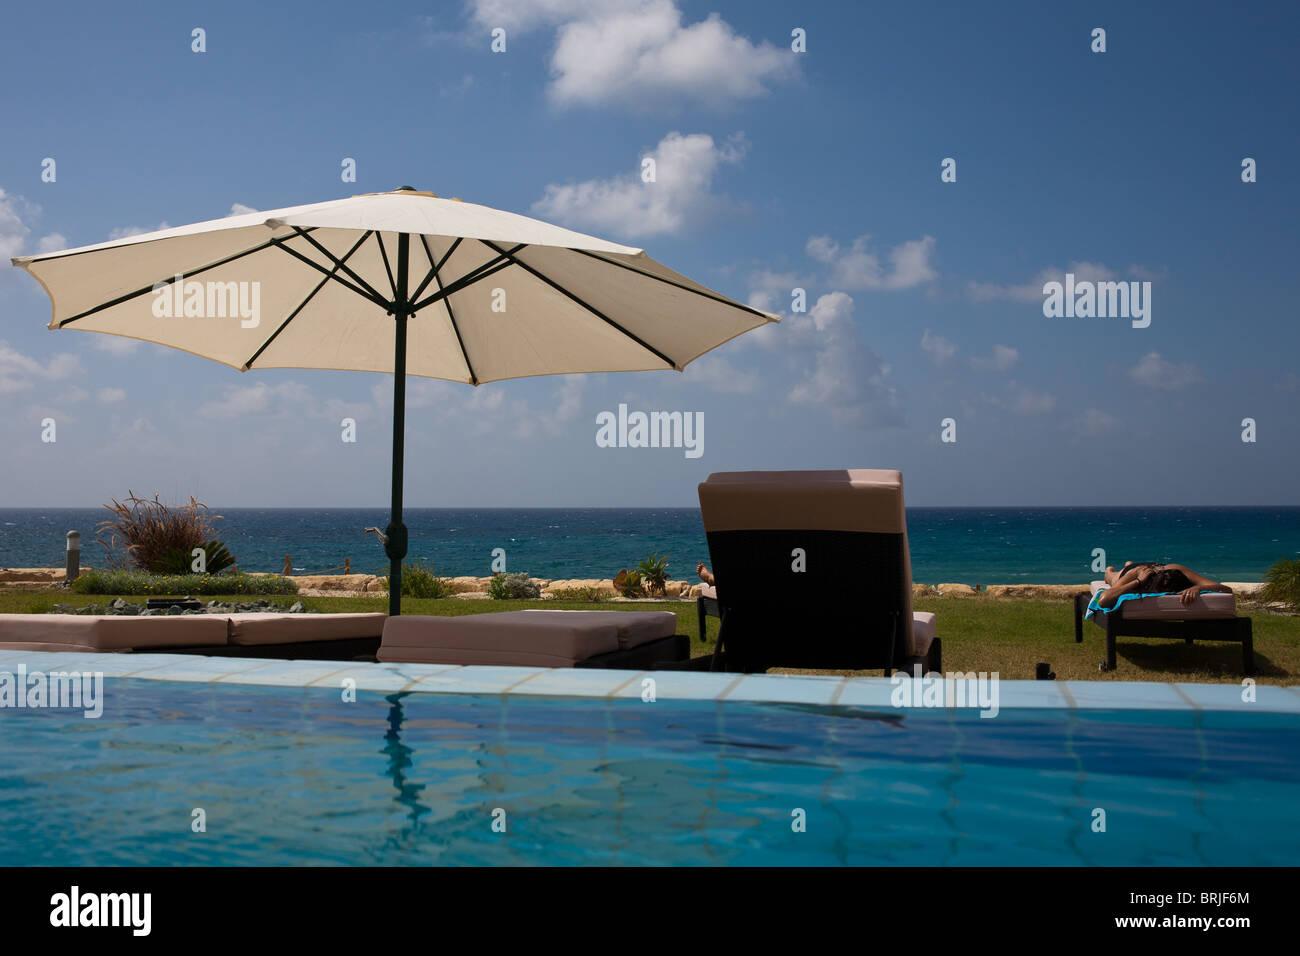 Swimming pool, parasol and Mediterranean Sea - Stock Image